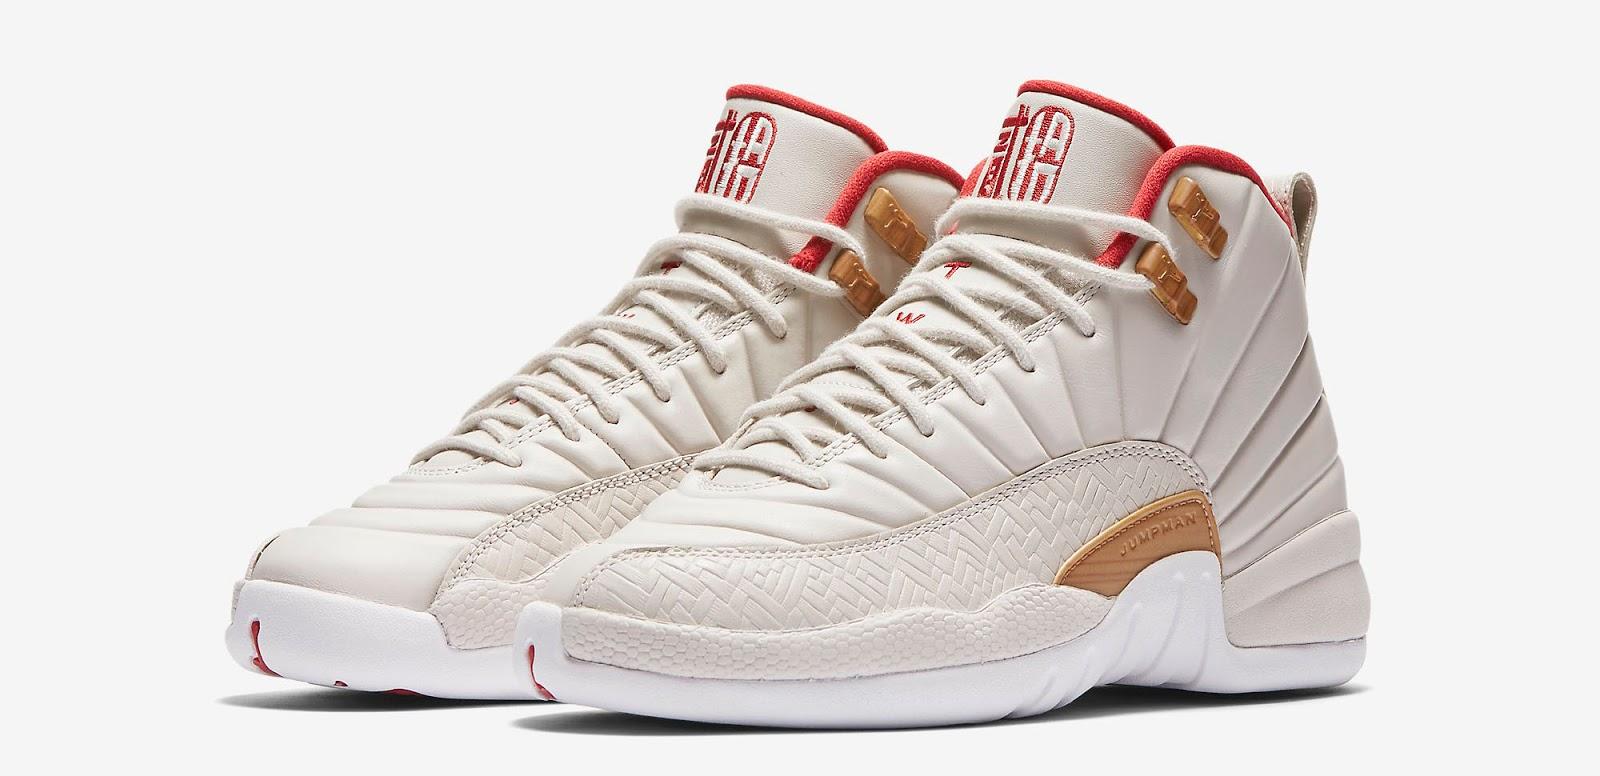 a55d25c0c8729f ajordanxi Your  1 Source For Sneaker Release Dates  Girls Air Jordan ...